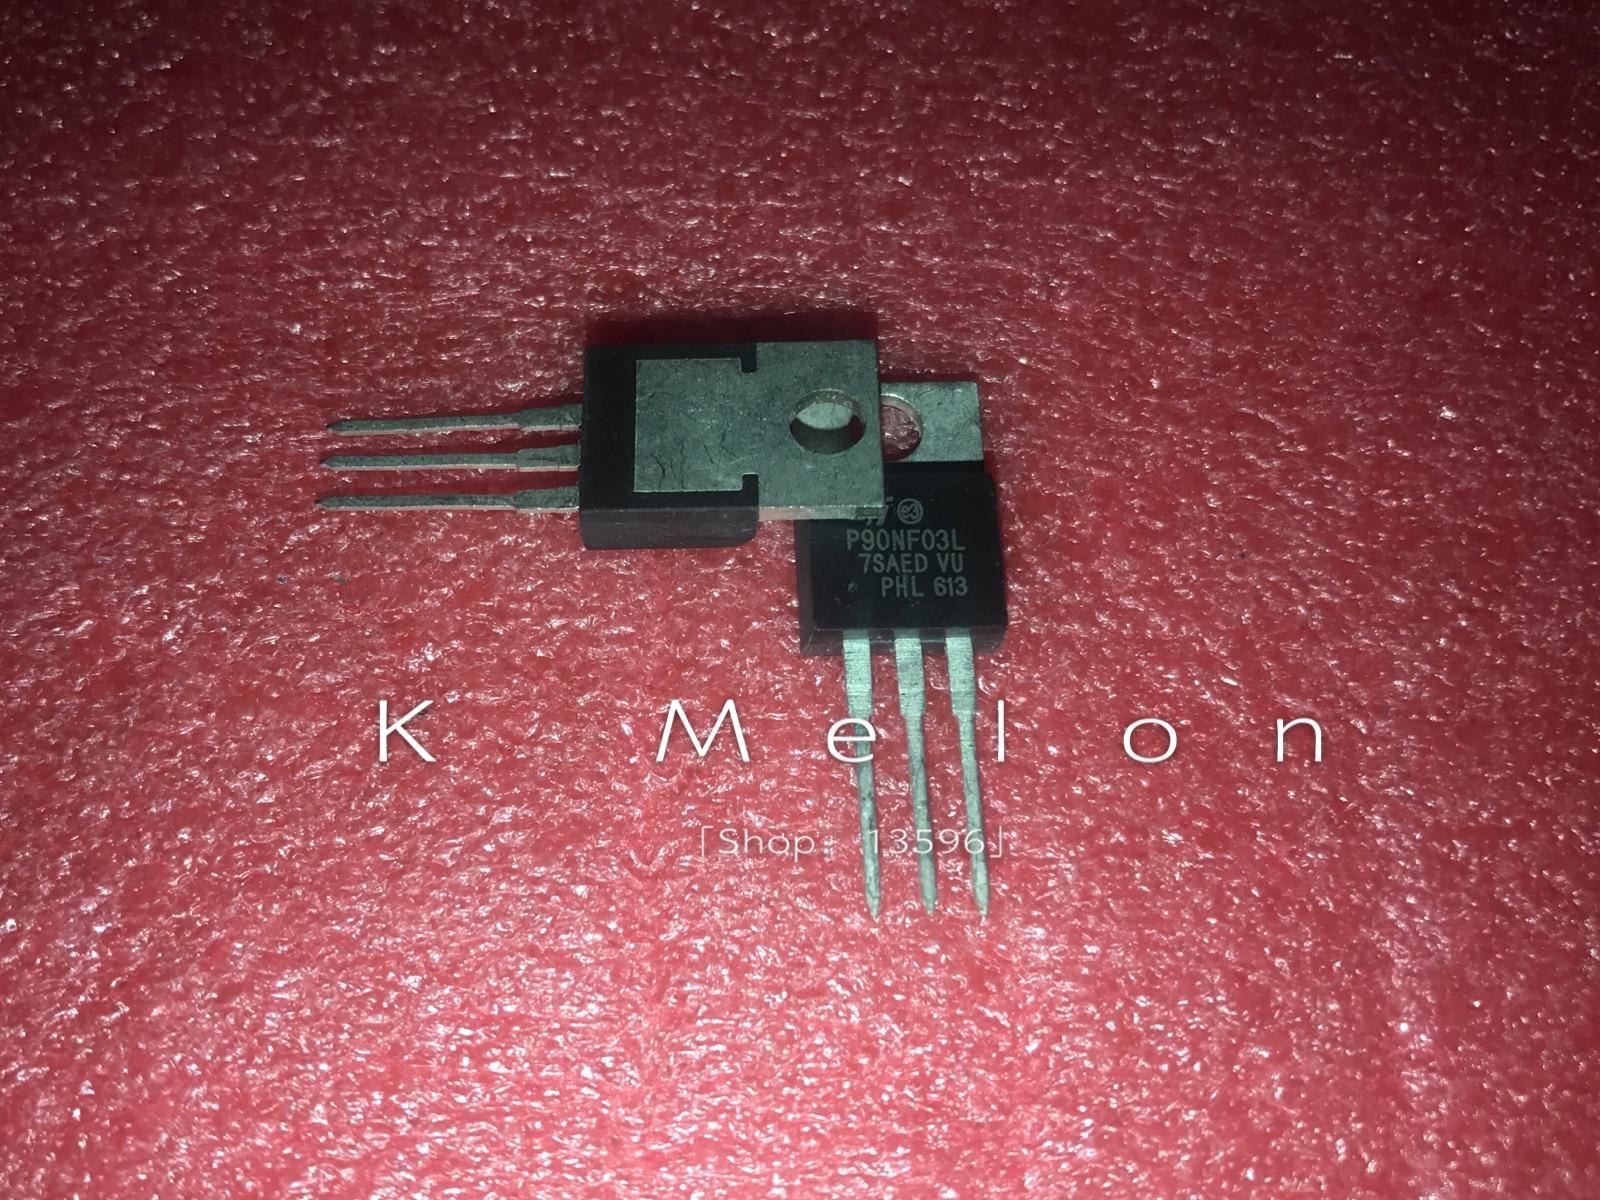 5 sztuk/10 sztuk STP90NF03L STP90NF03 P90NF03L P90NF03 90NF03 TO-220 90A 30V moc mosfet tranzystor